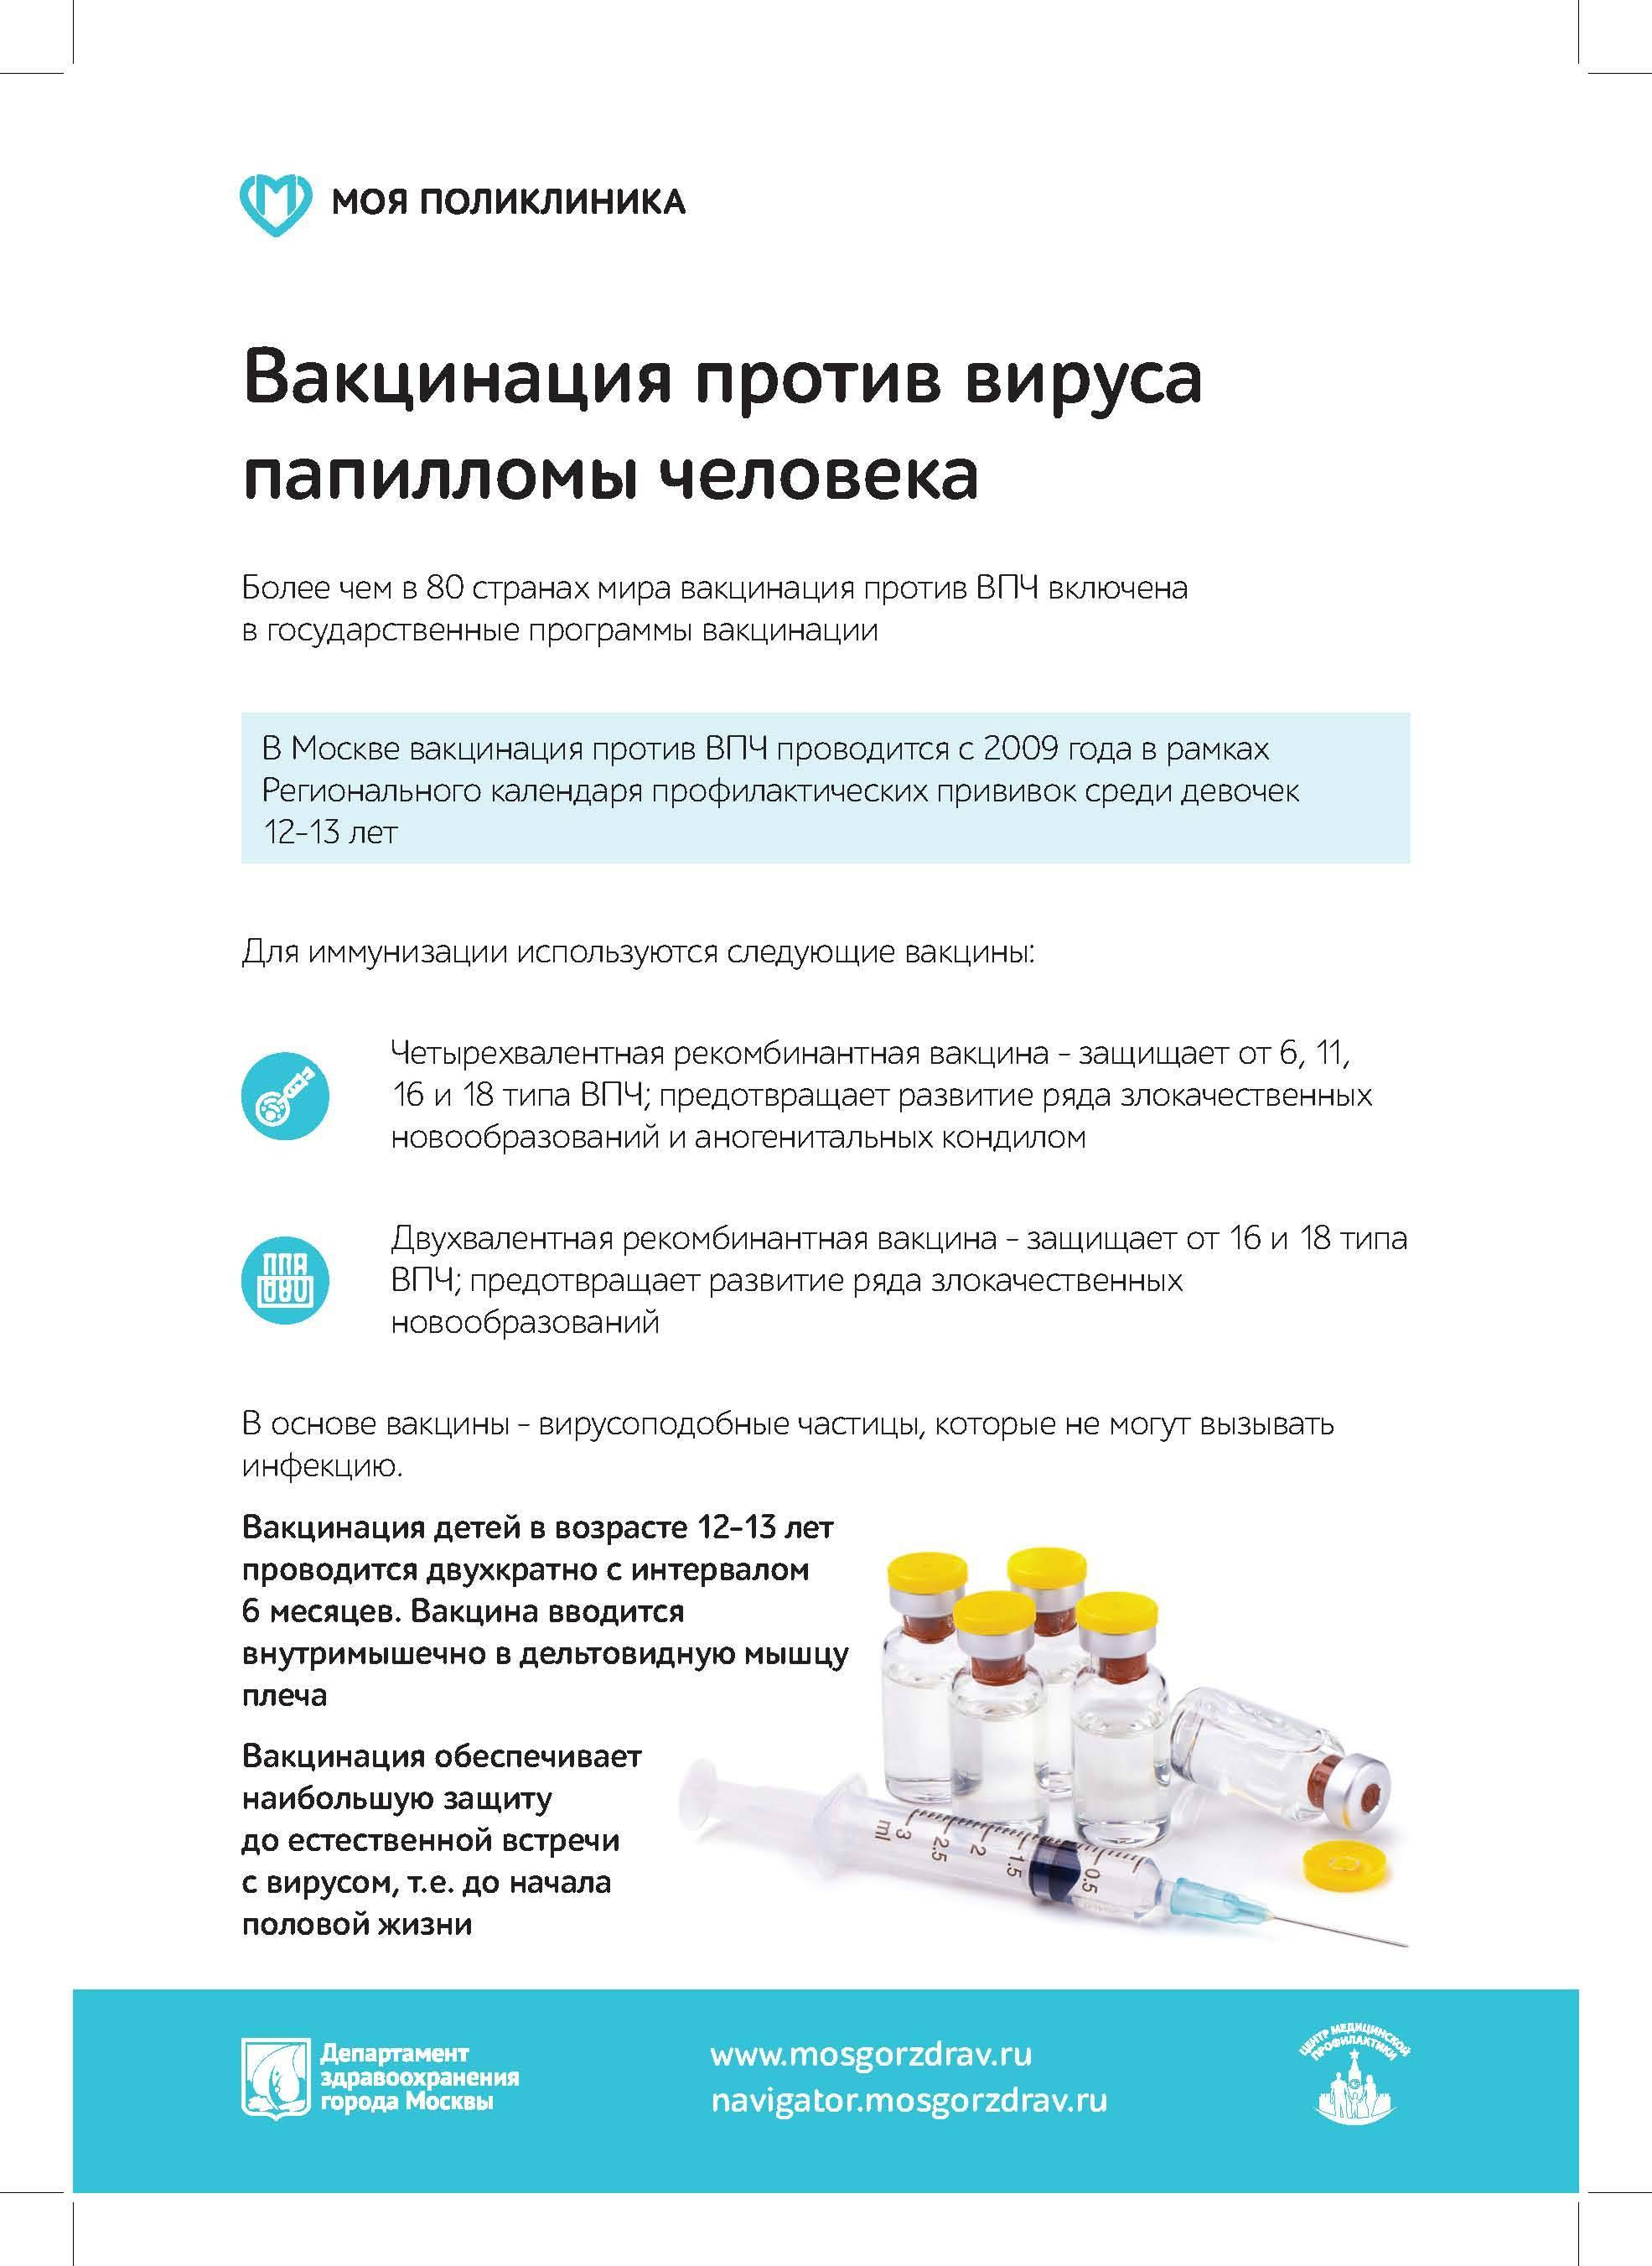 Вакцинация девочек ?⚕️ против папилломавируса человека — топотушки